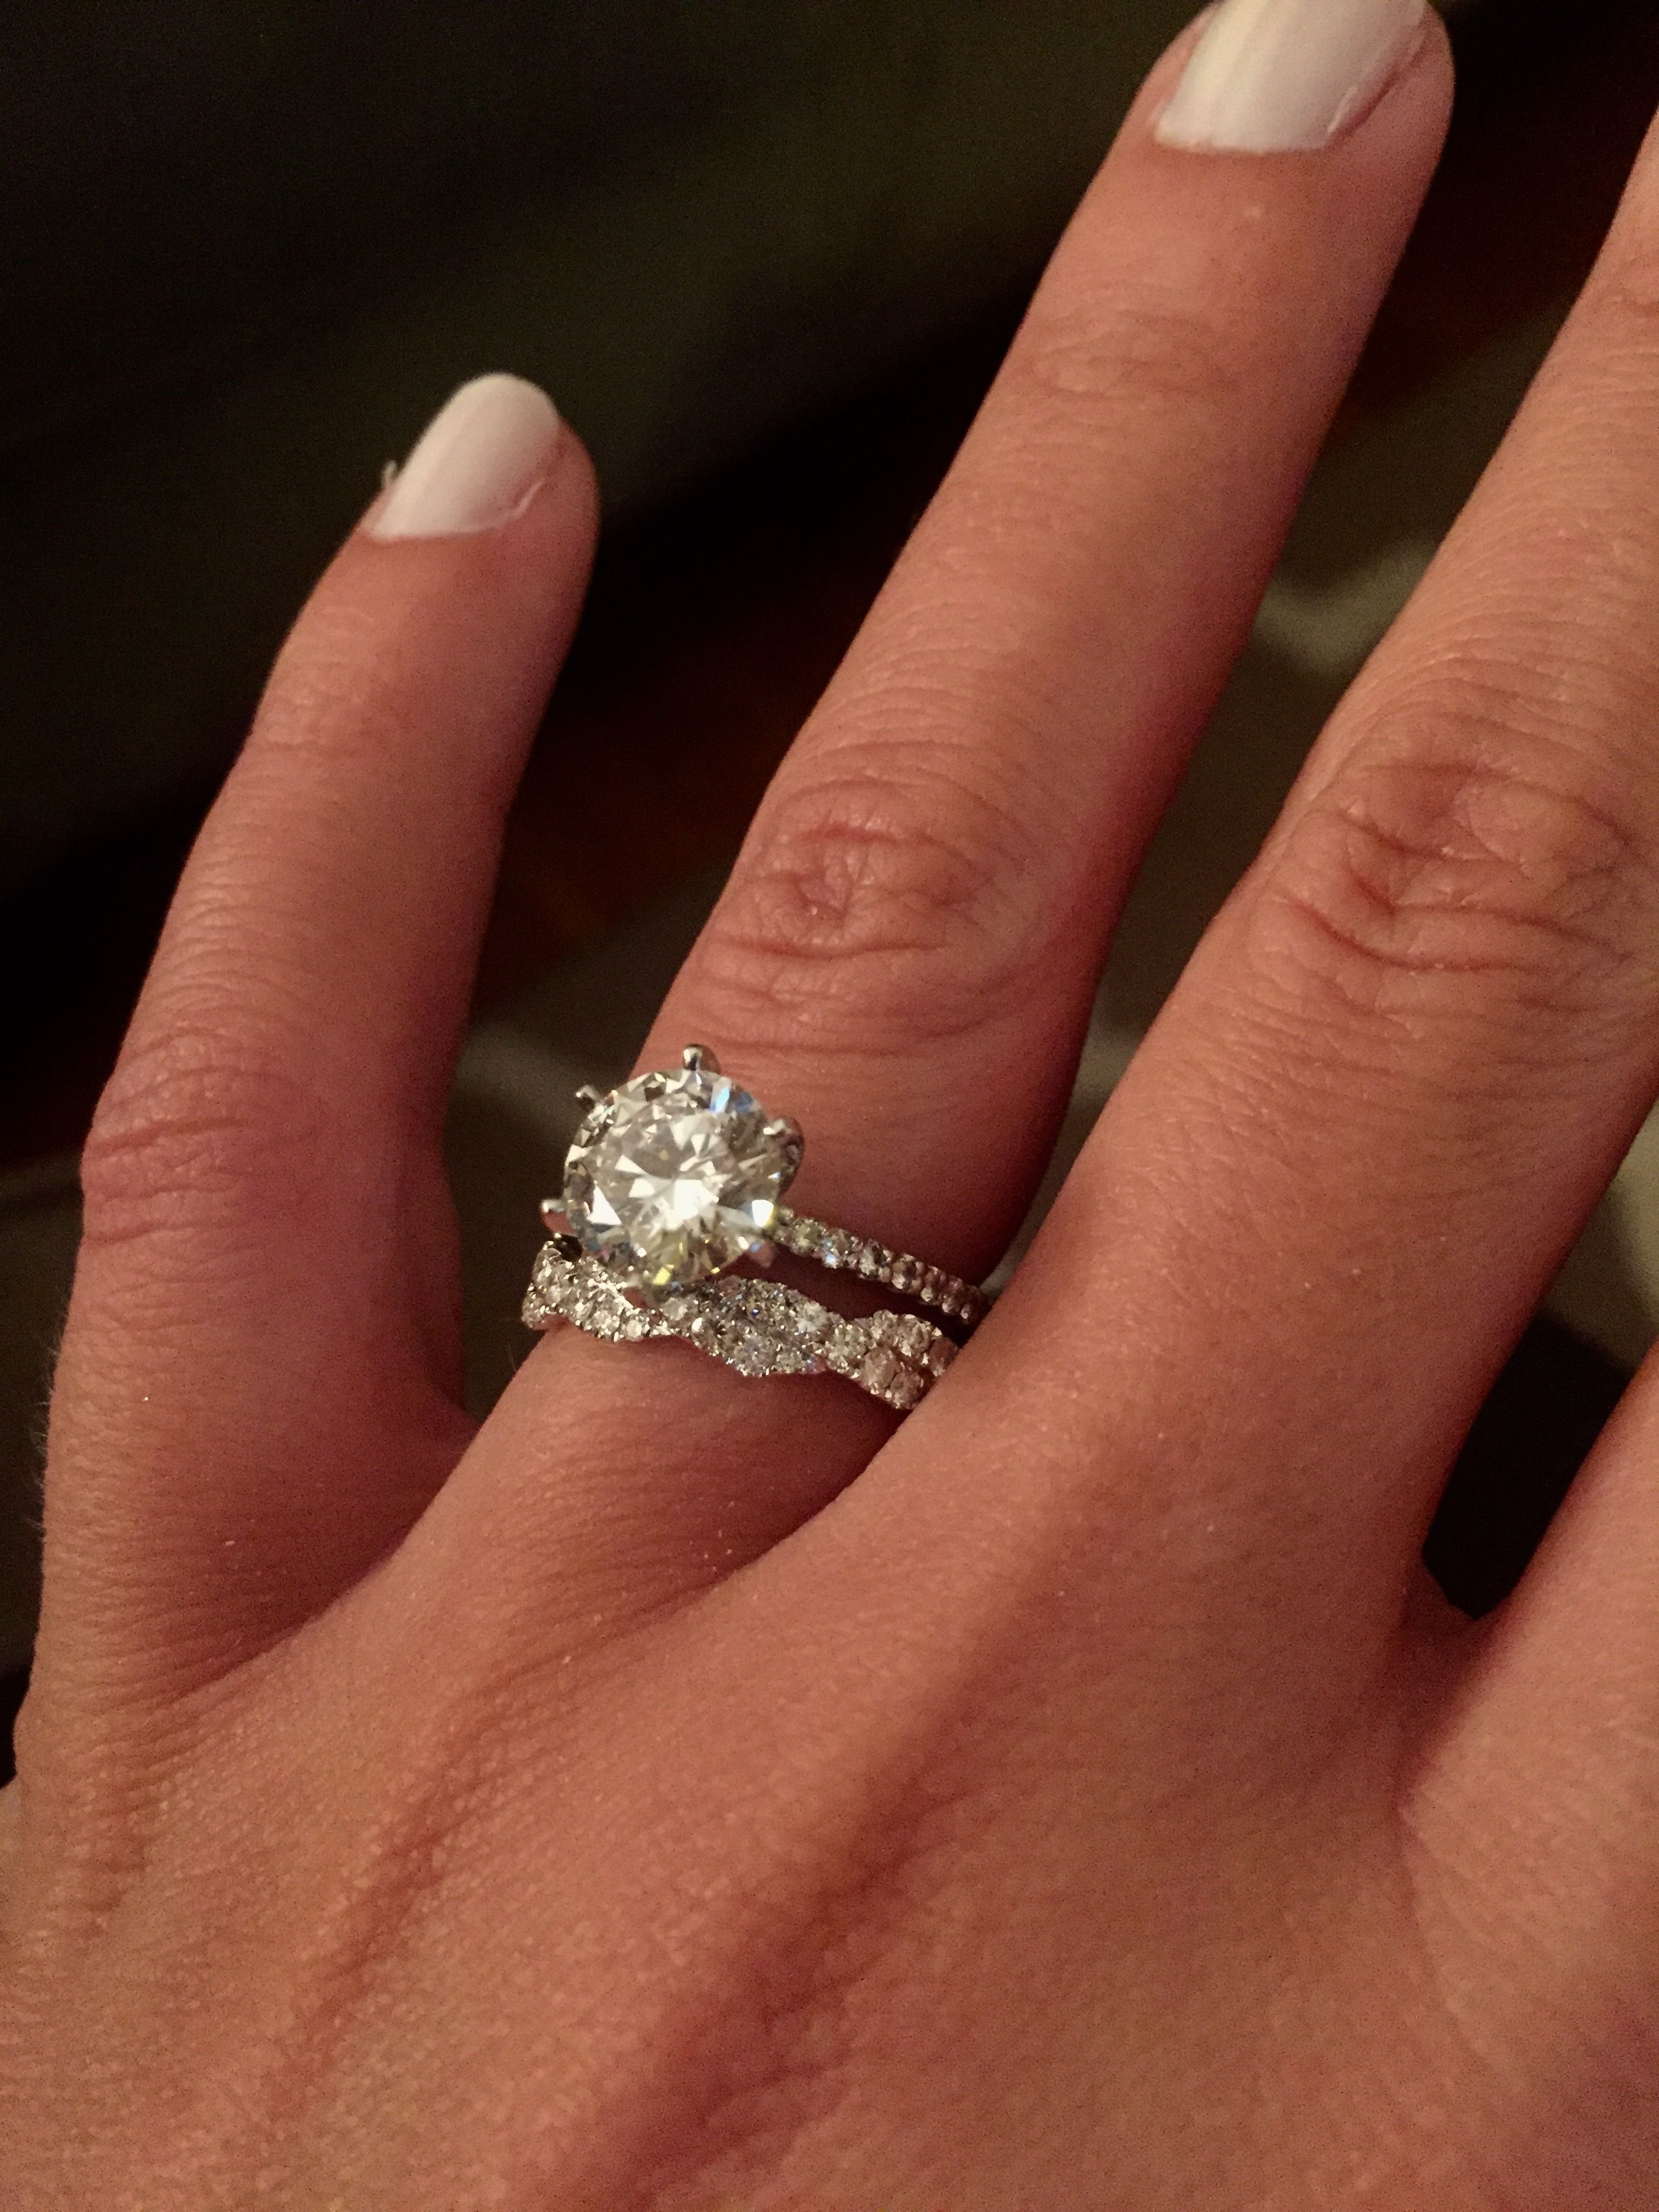 Engagement ring wedding band combo round diamond with